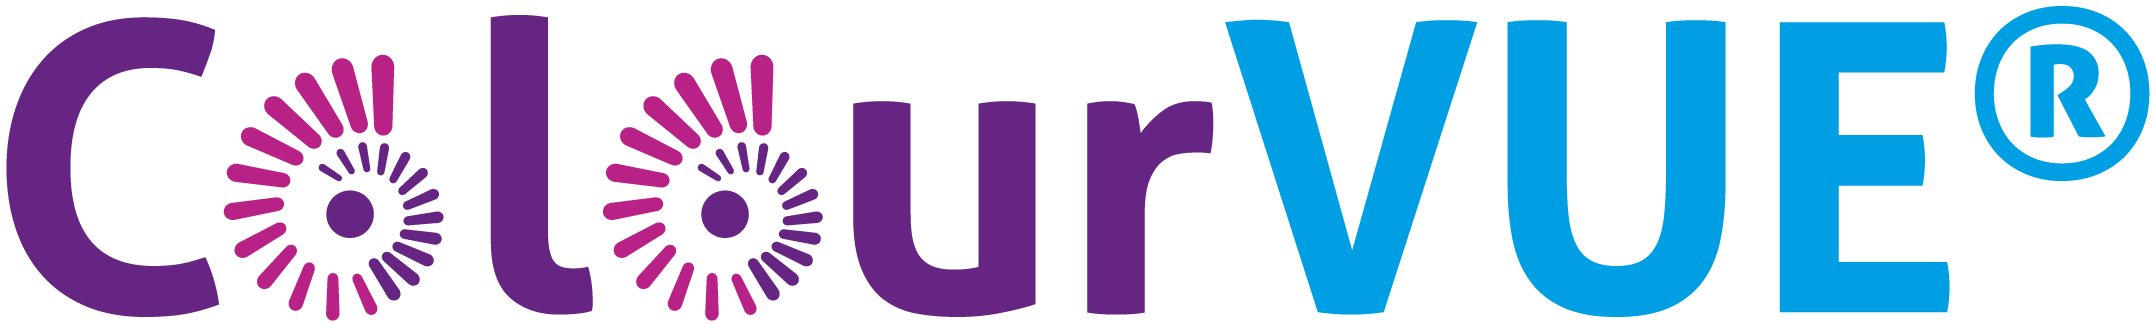 ColourVUE-Logo-01